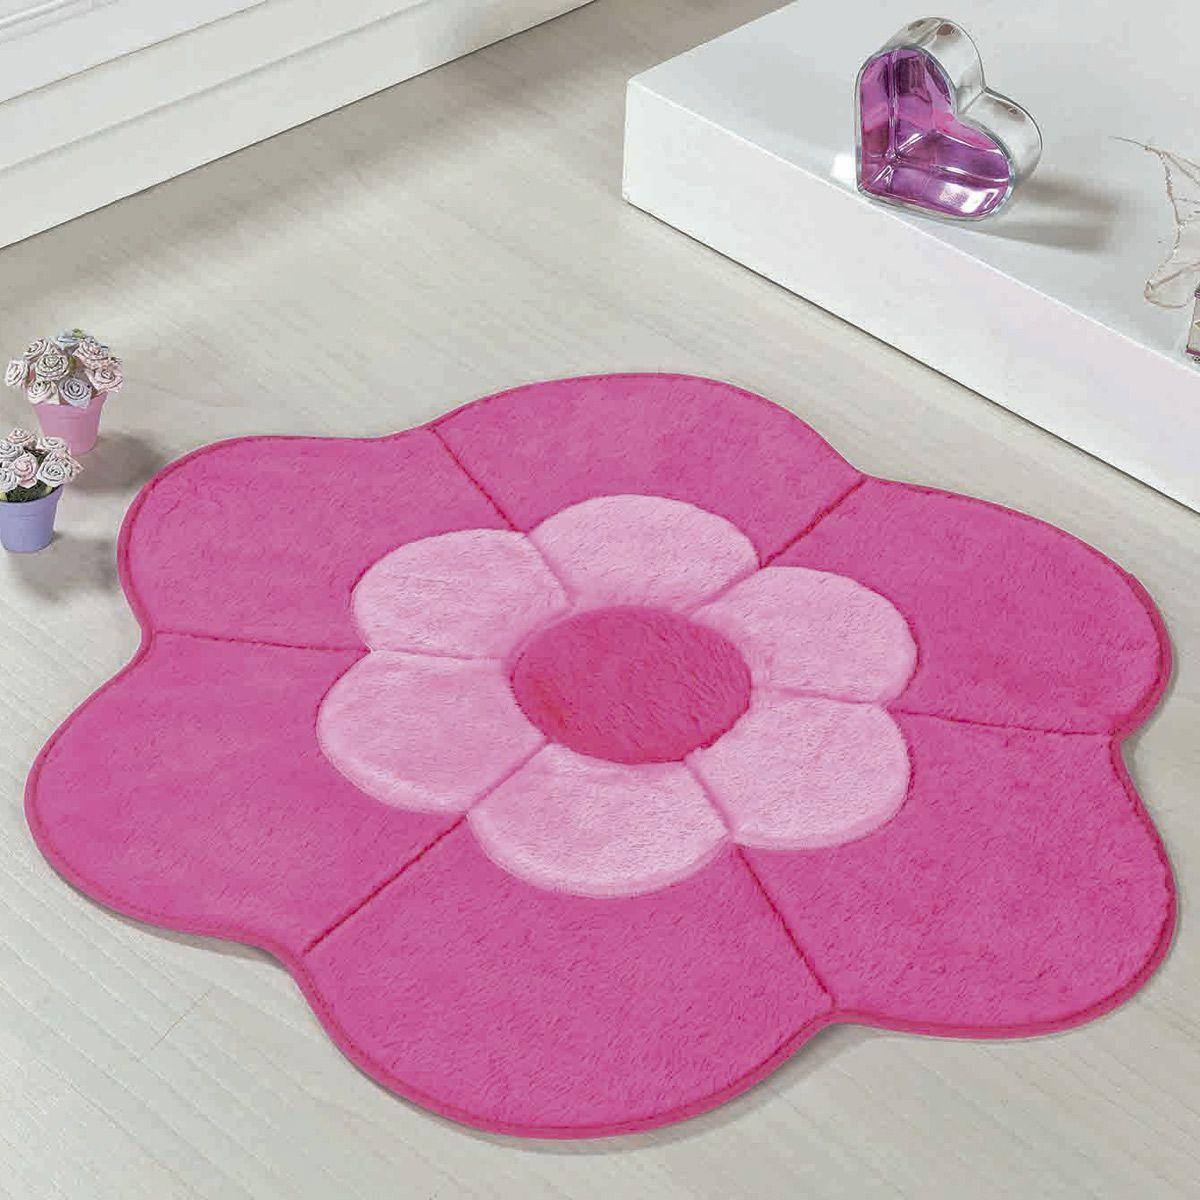 Tapete Big Infantil Premium Formato Margarida Dupla Pink 1,12m x 1,12m